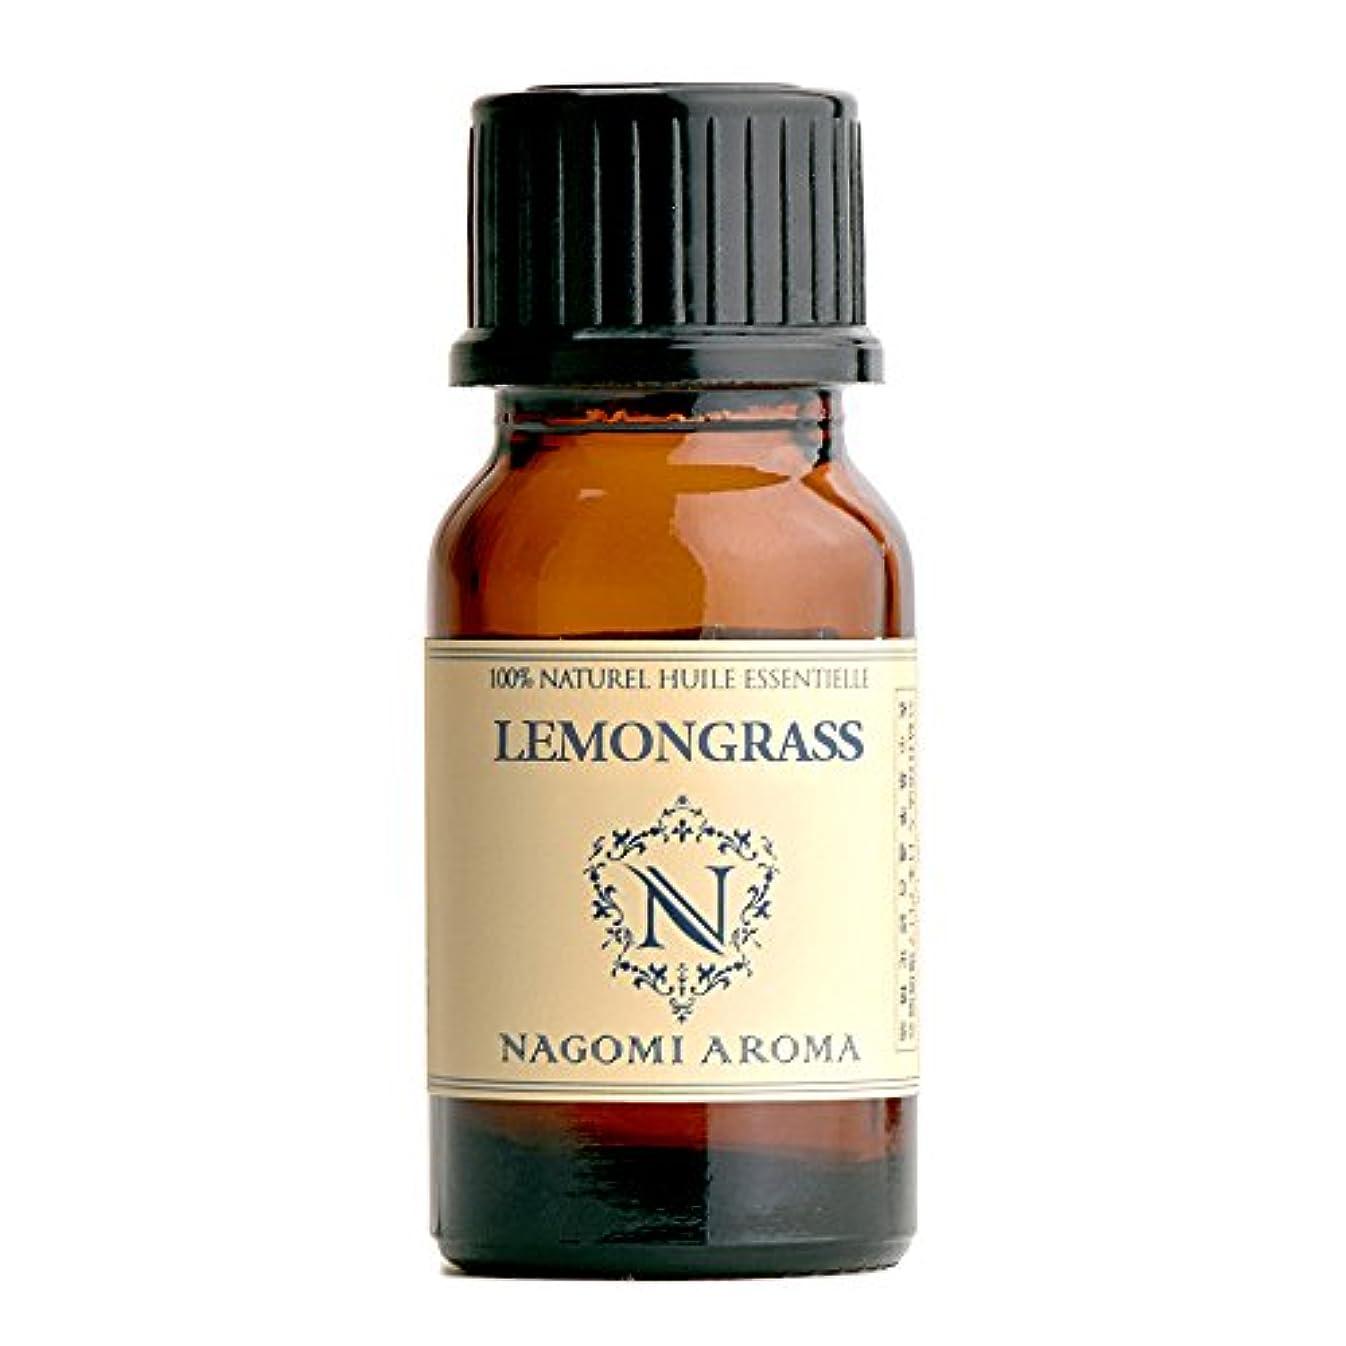 NAGOMI AROMA レモングラス 10ml 【AEAJ認定精油】【アロマオイル】